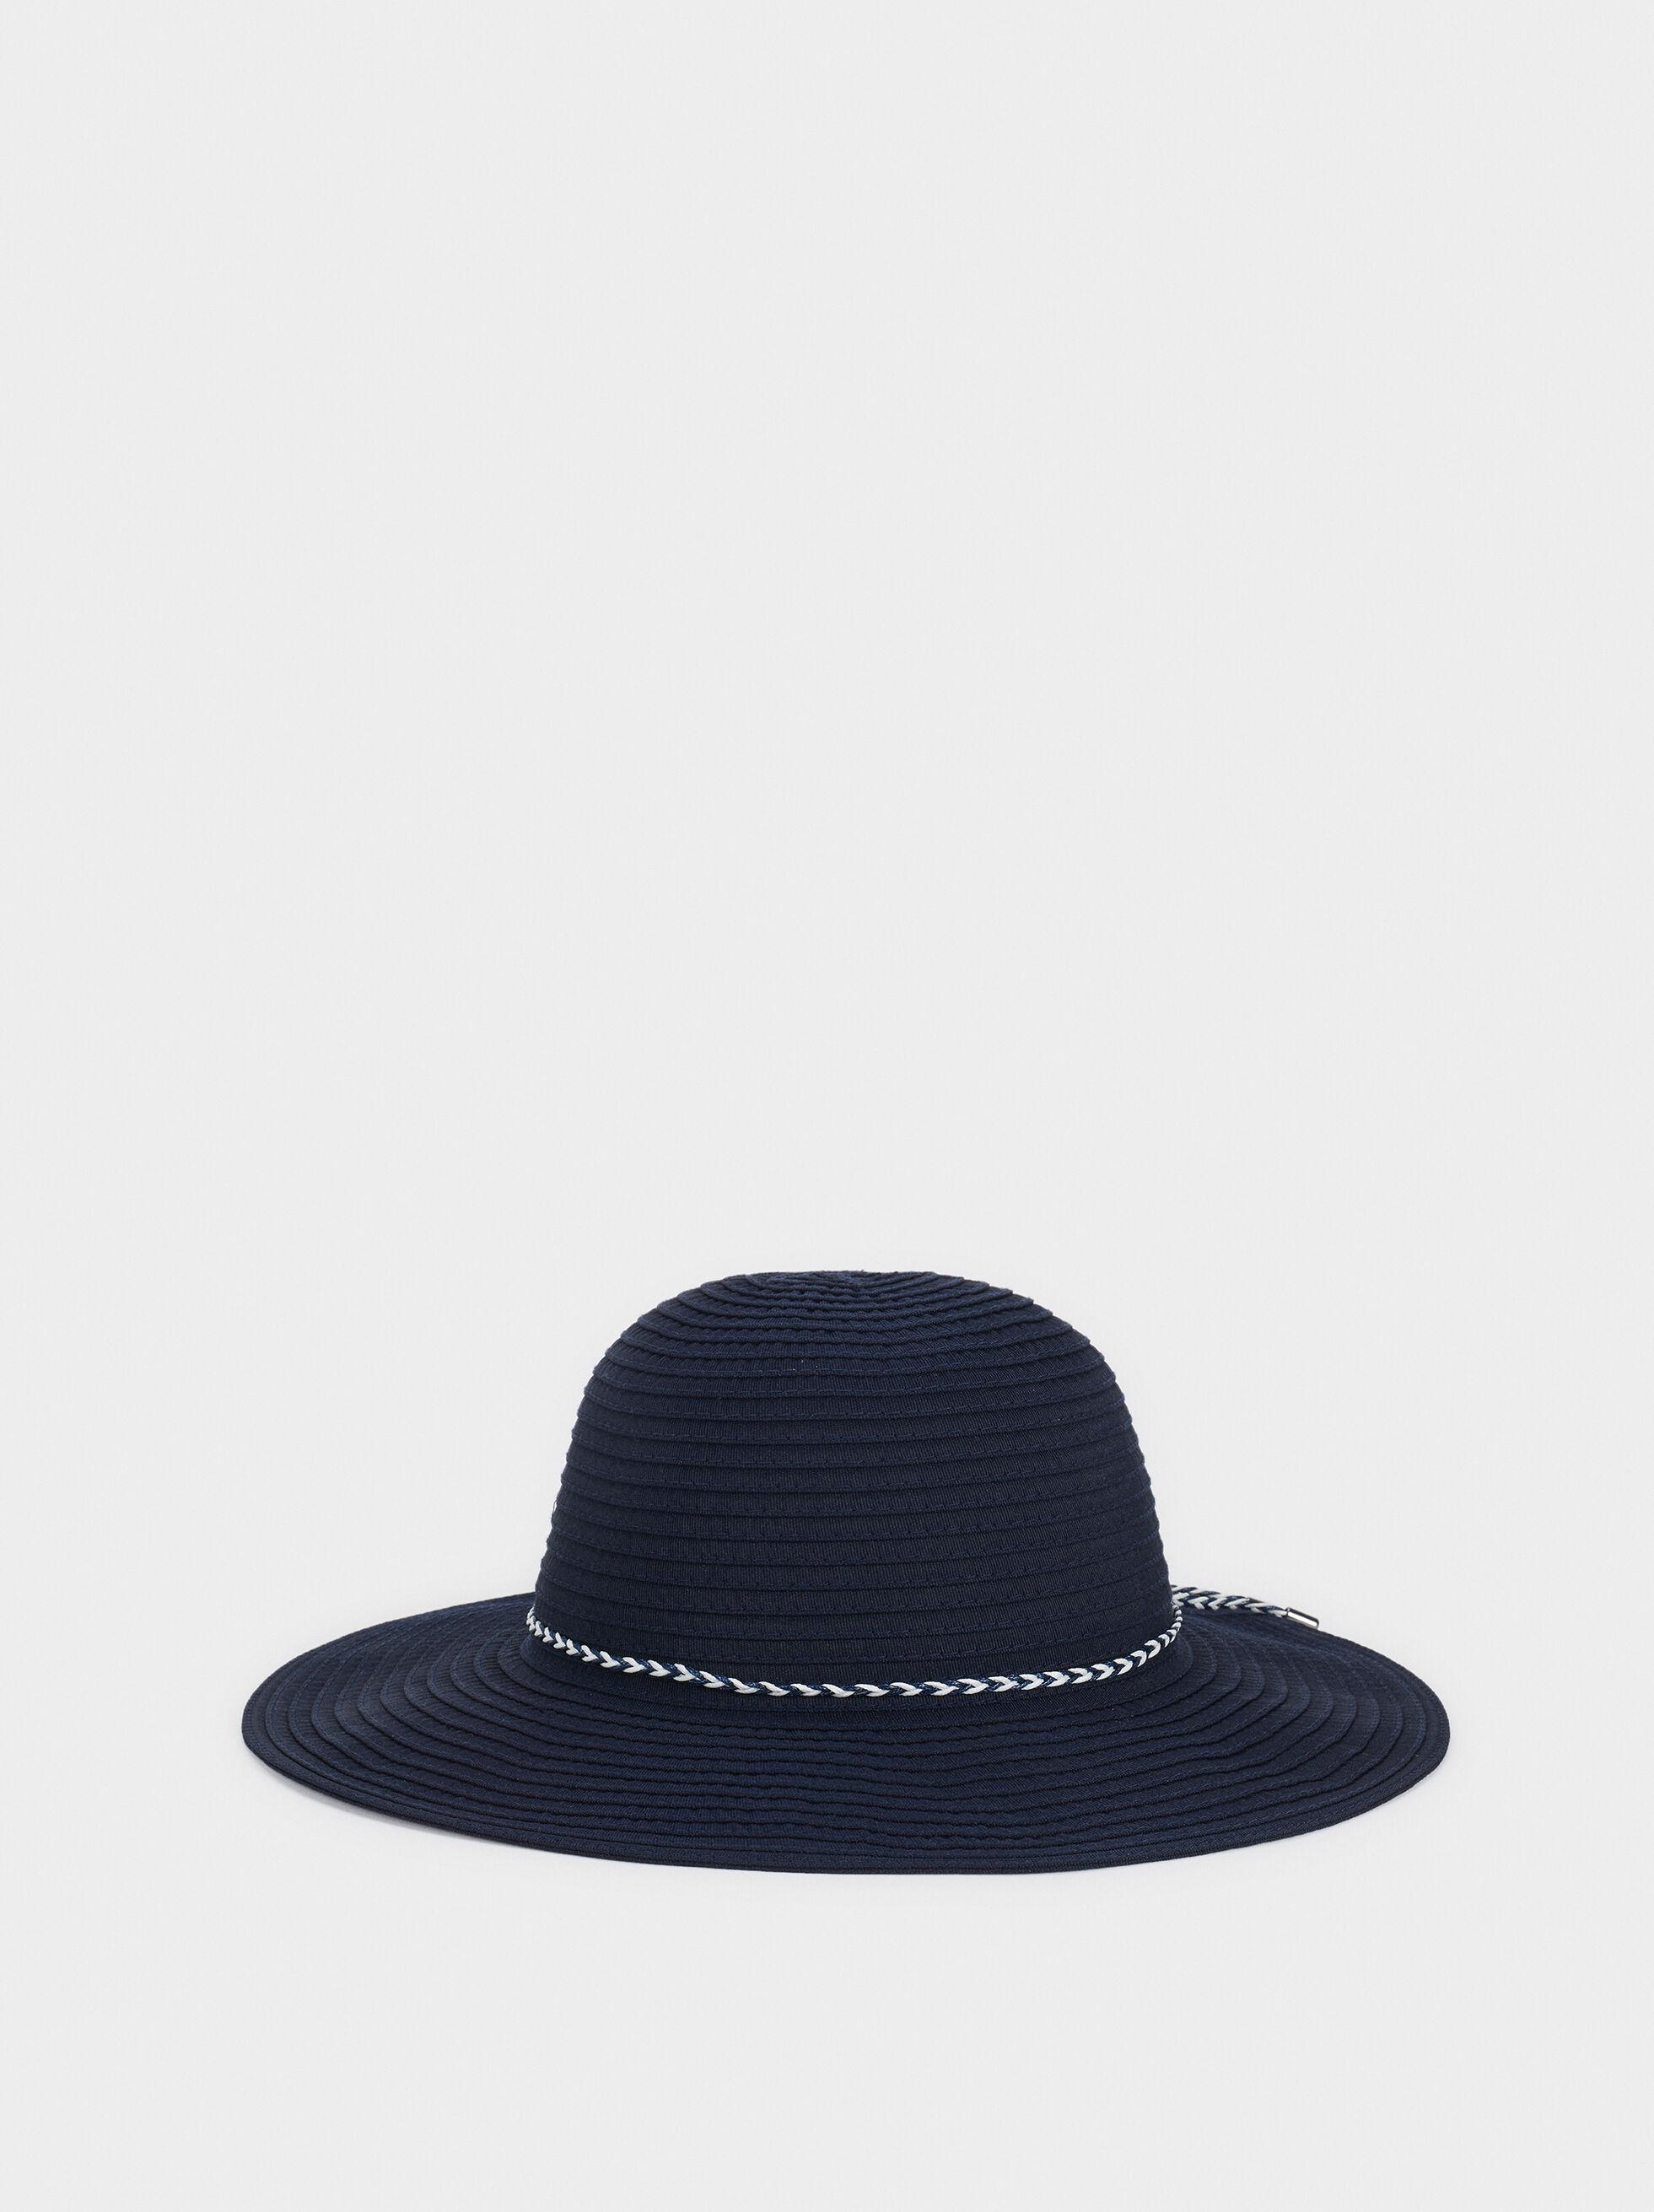 Chapéu Com Fita Combinada, Azul Marinho, hi-res